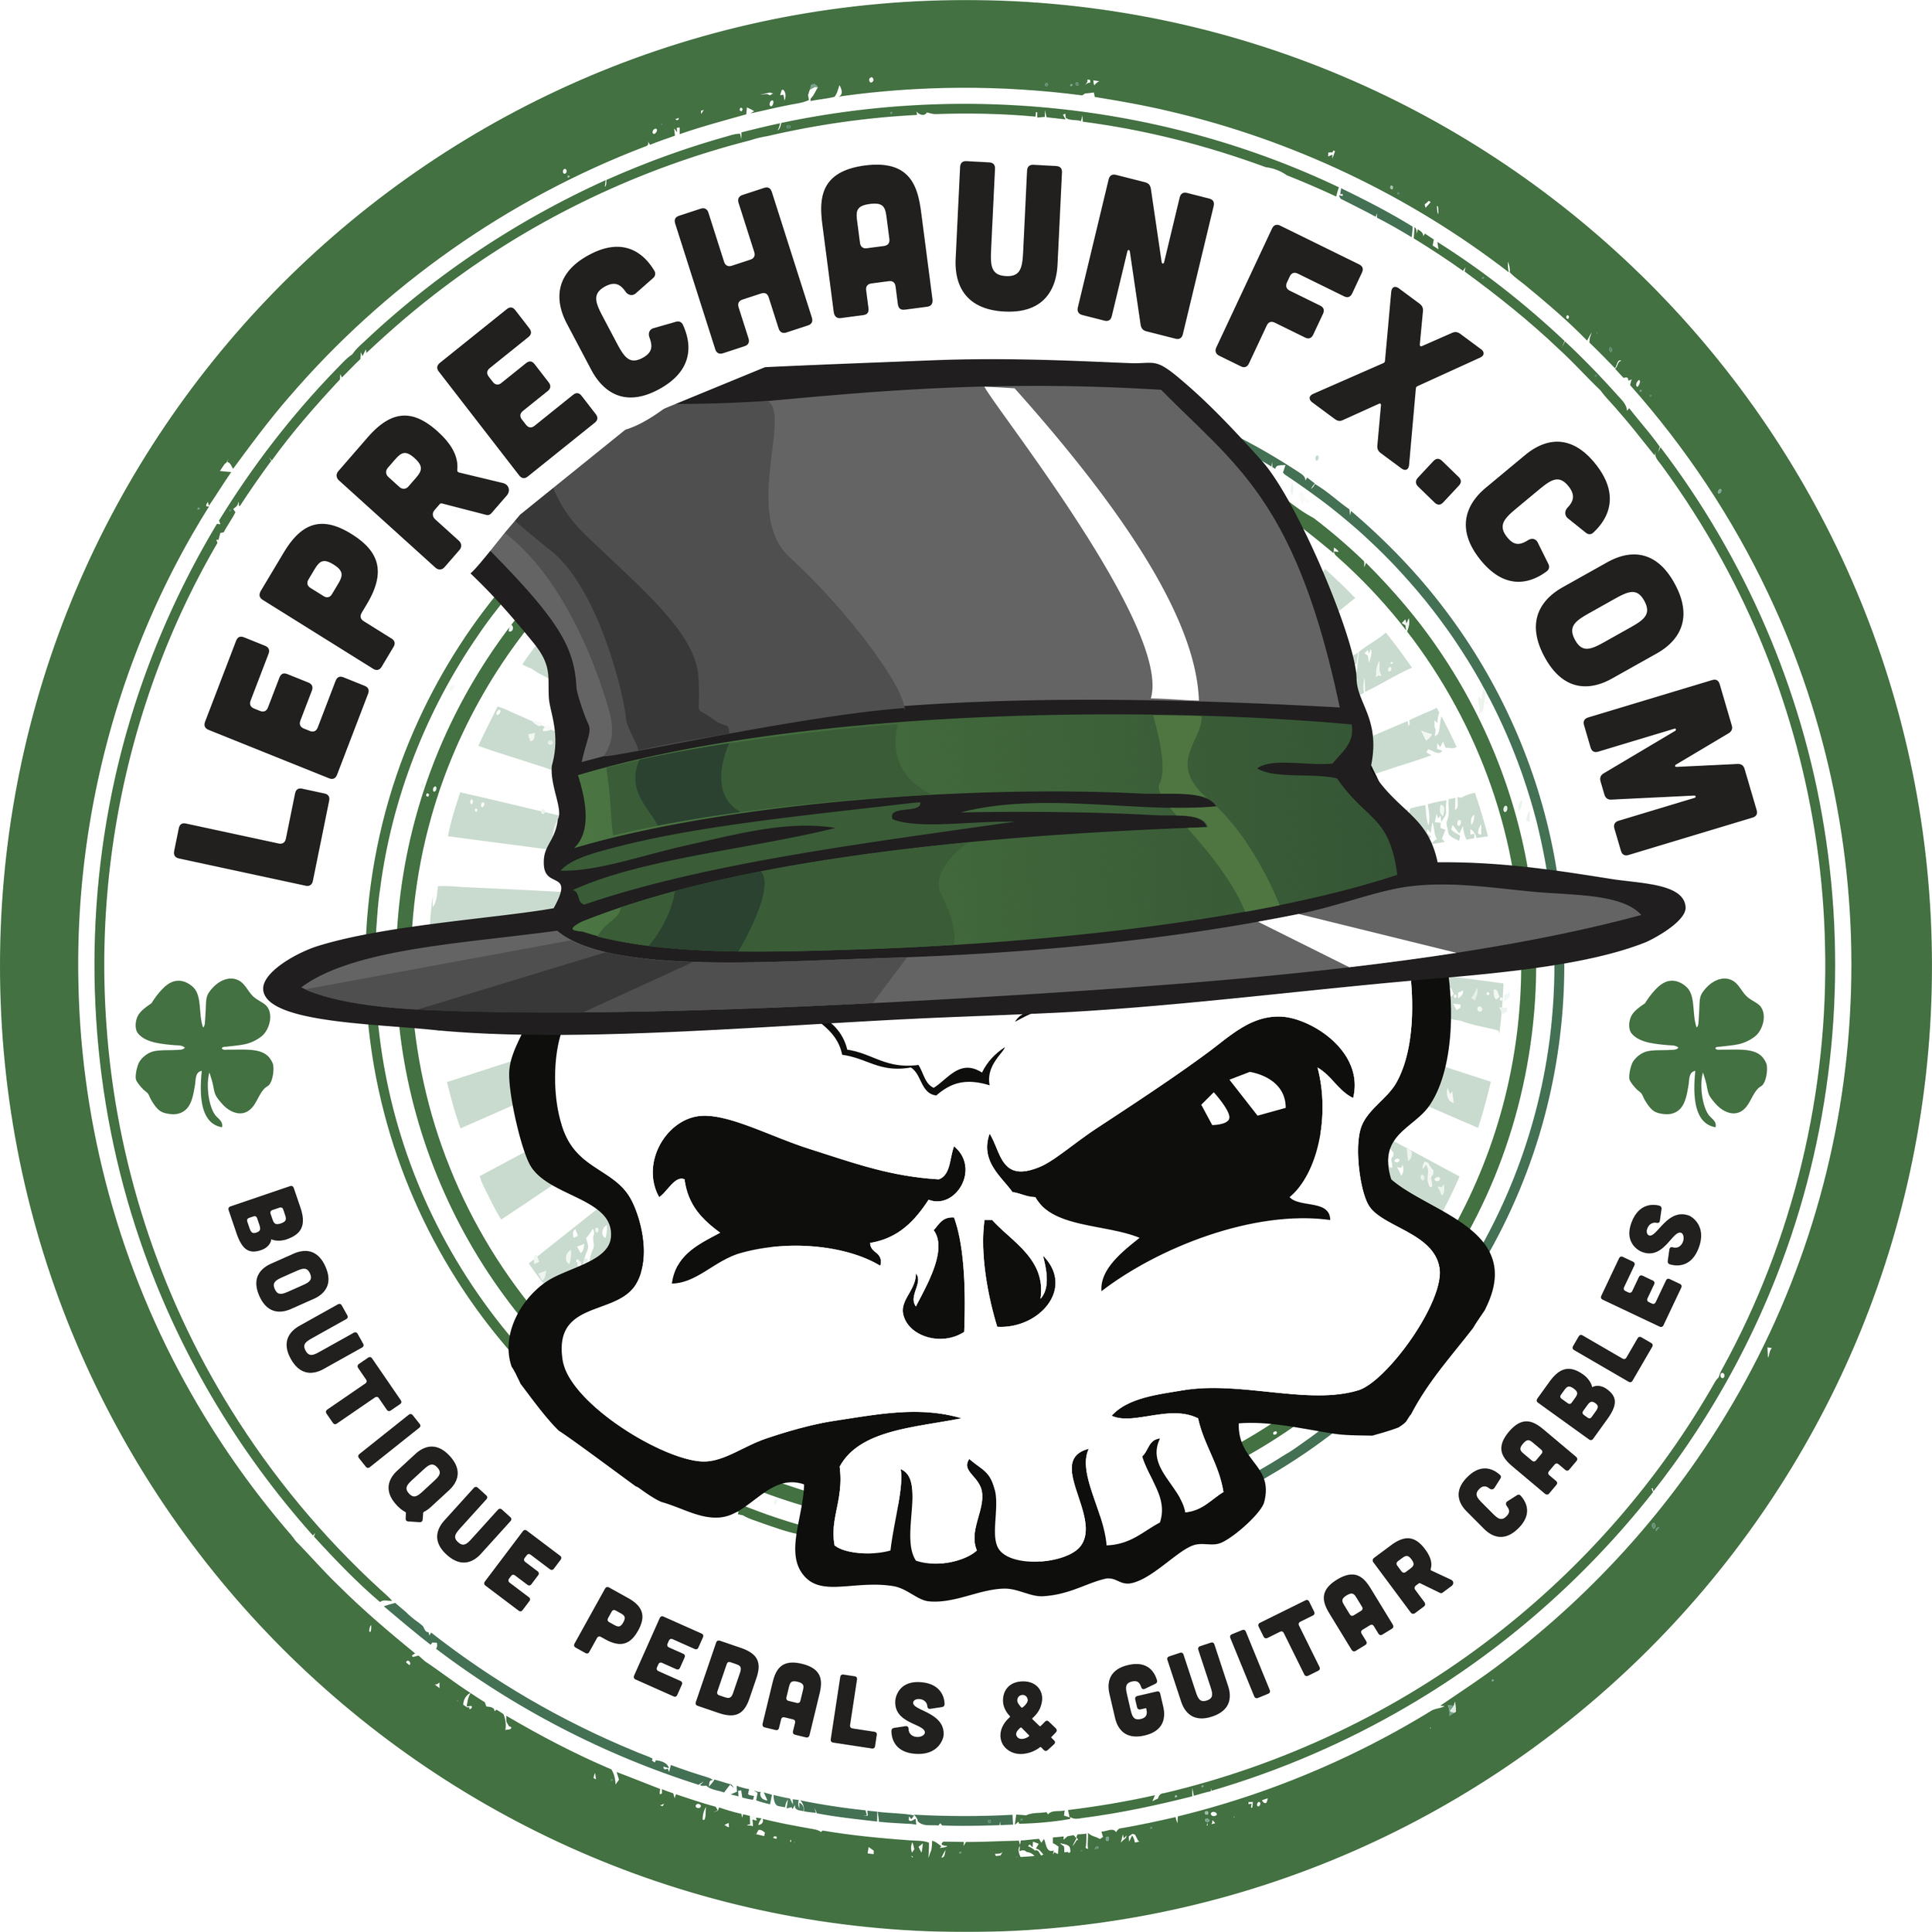 leprechaun-fx-logo-website-products-final.jpg